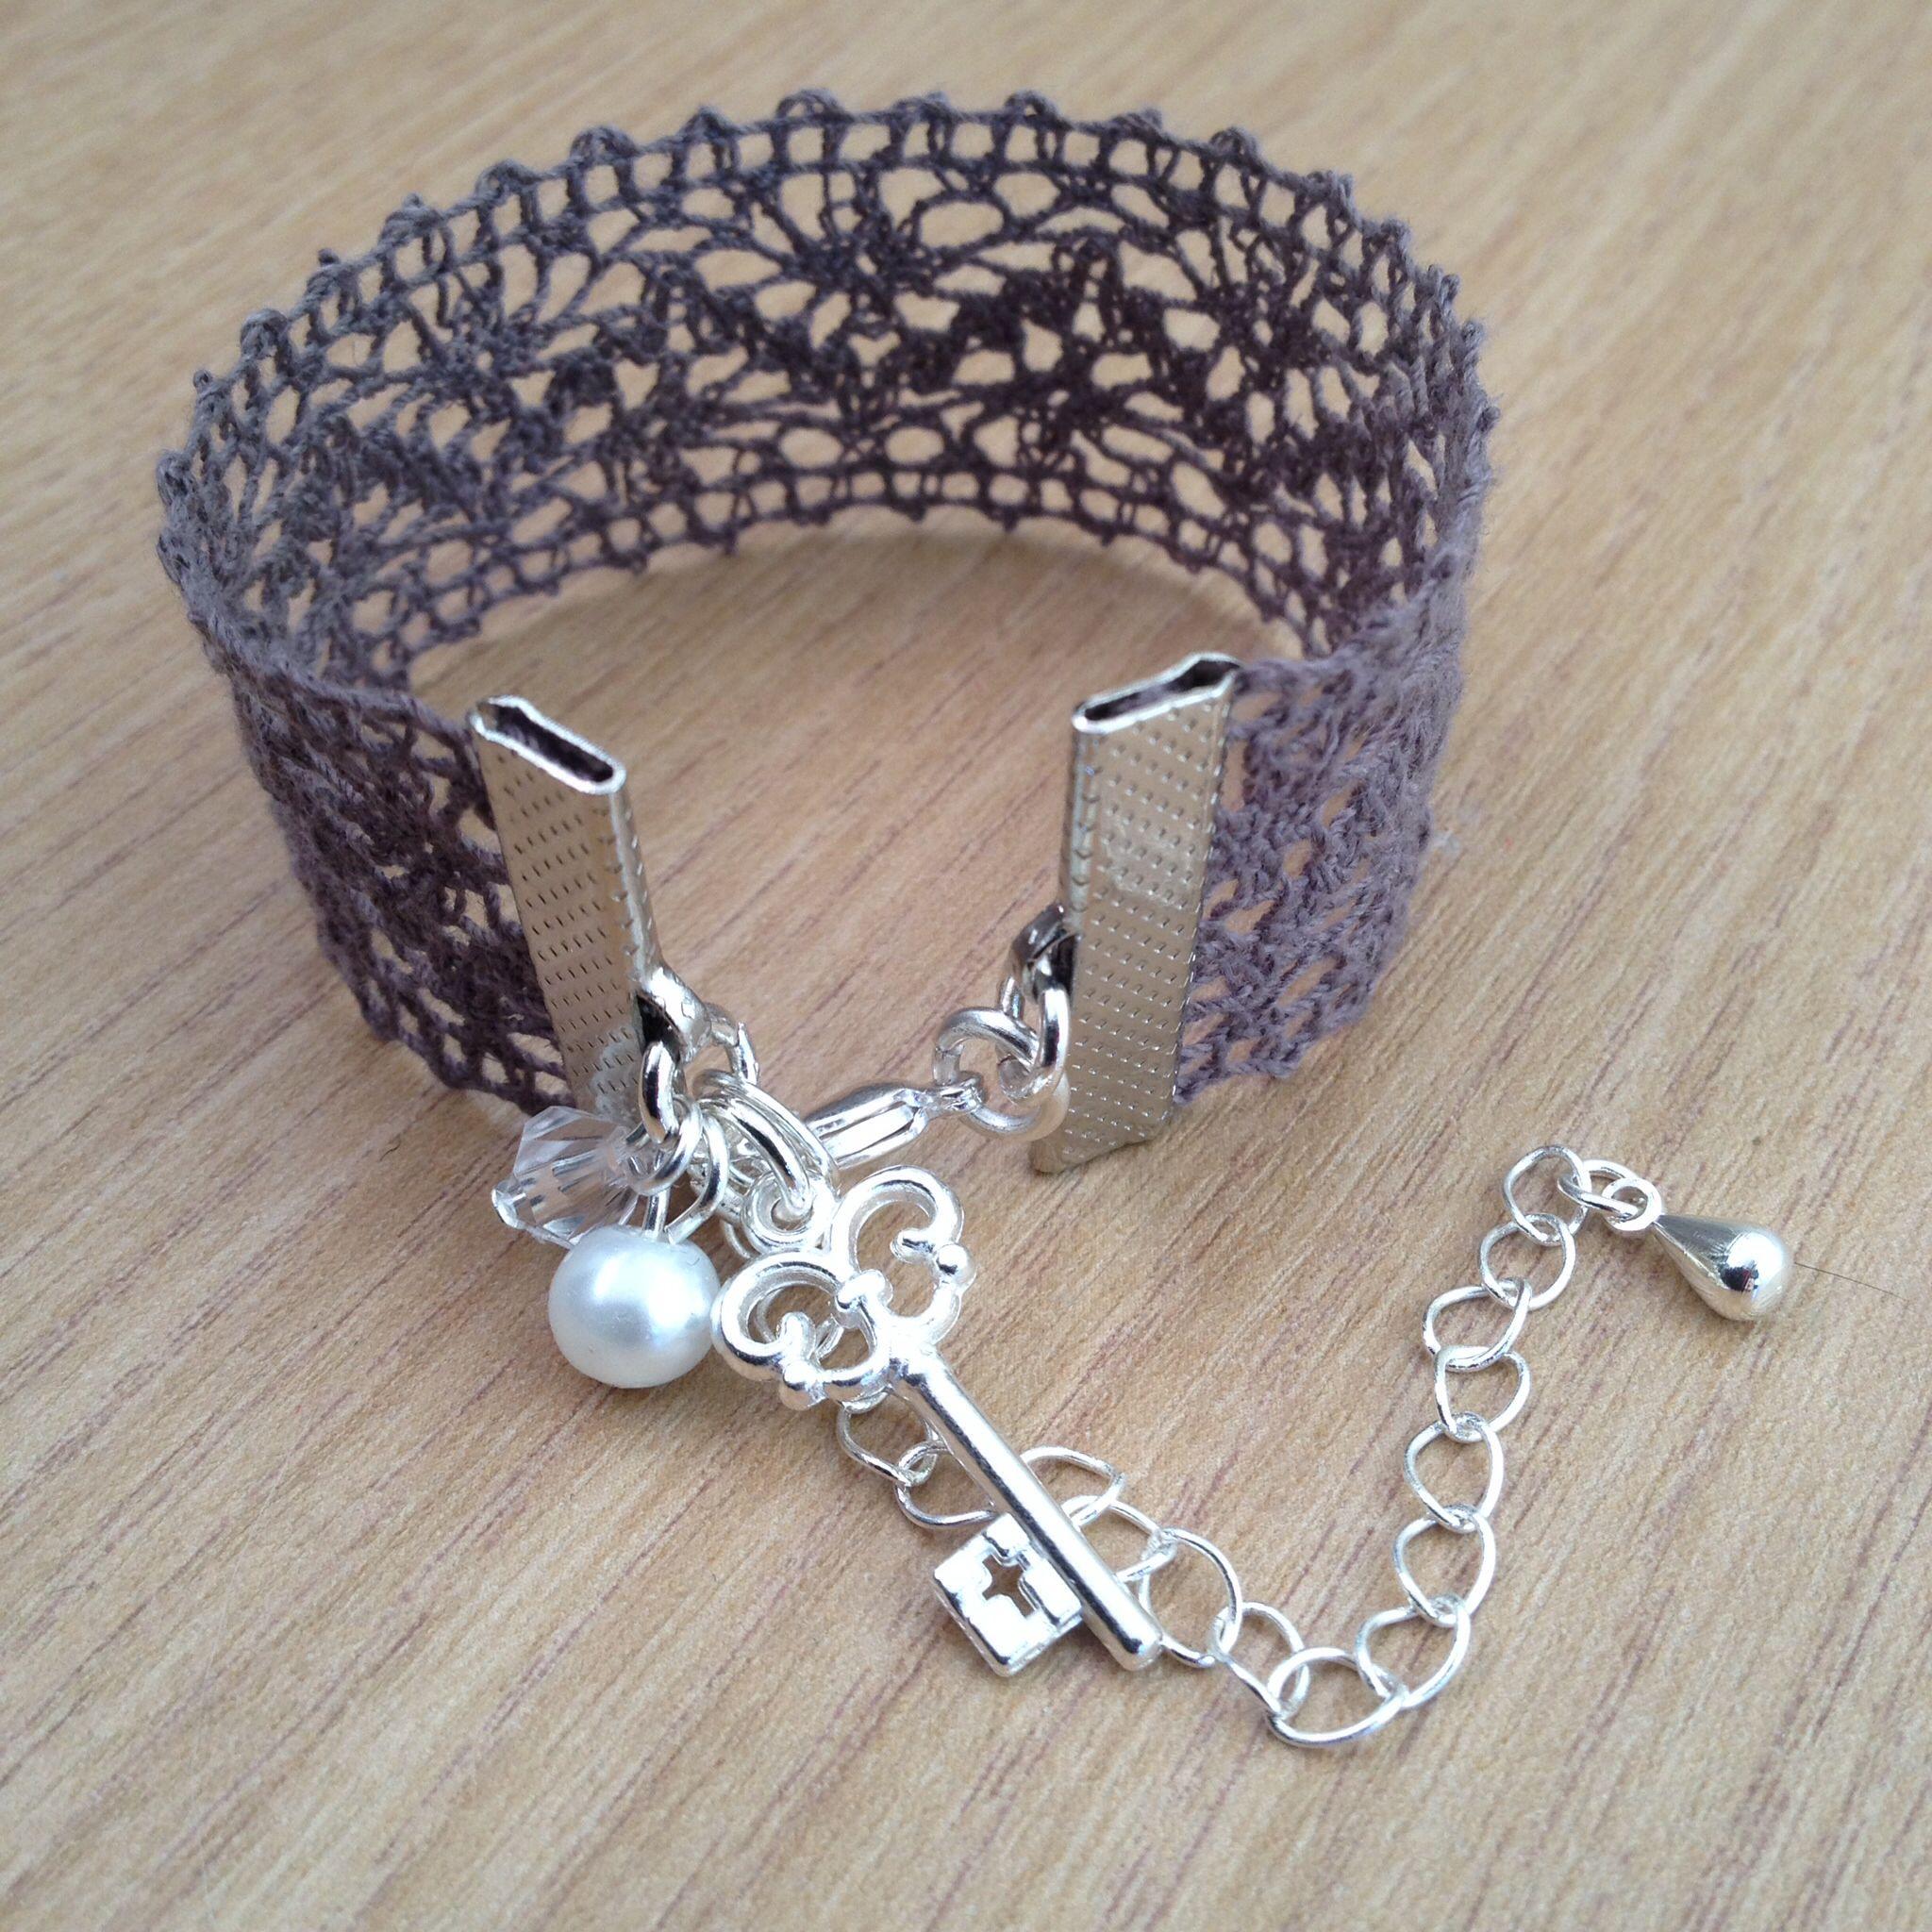 Diy Lace Bracelet Diy Lace Earrings Lace Bracelet Lace Cuff Bracelet